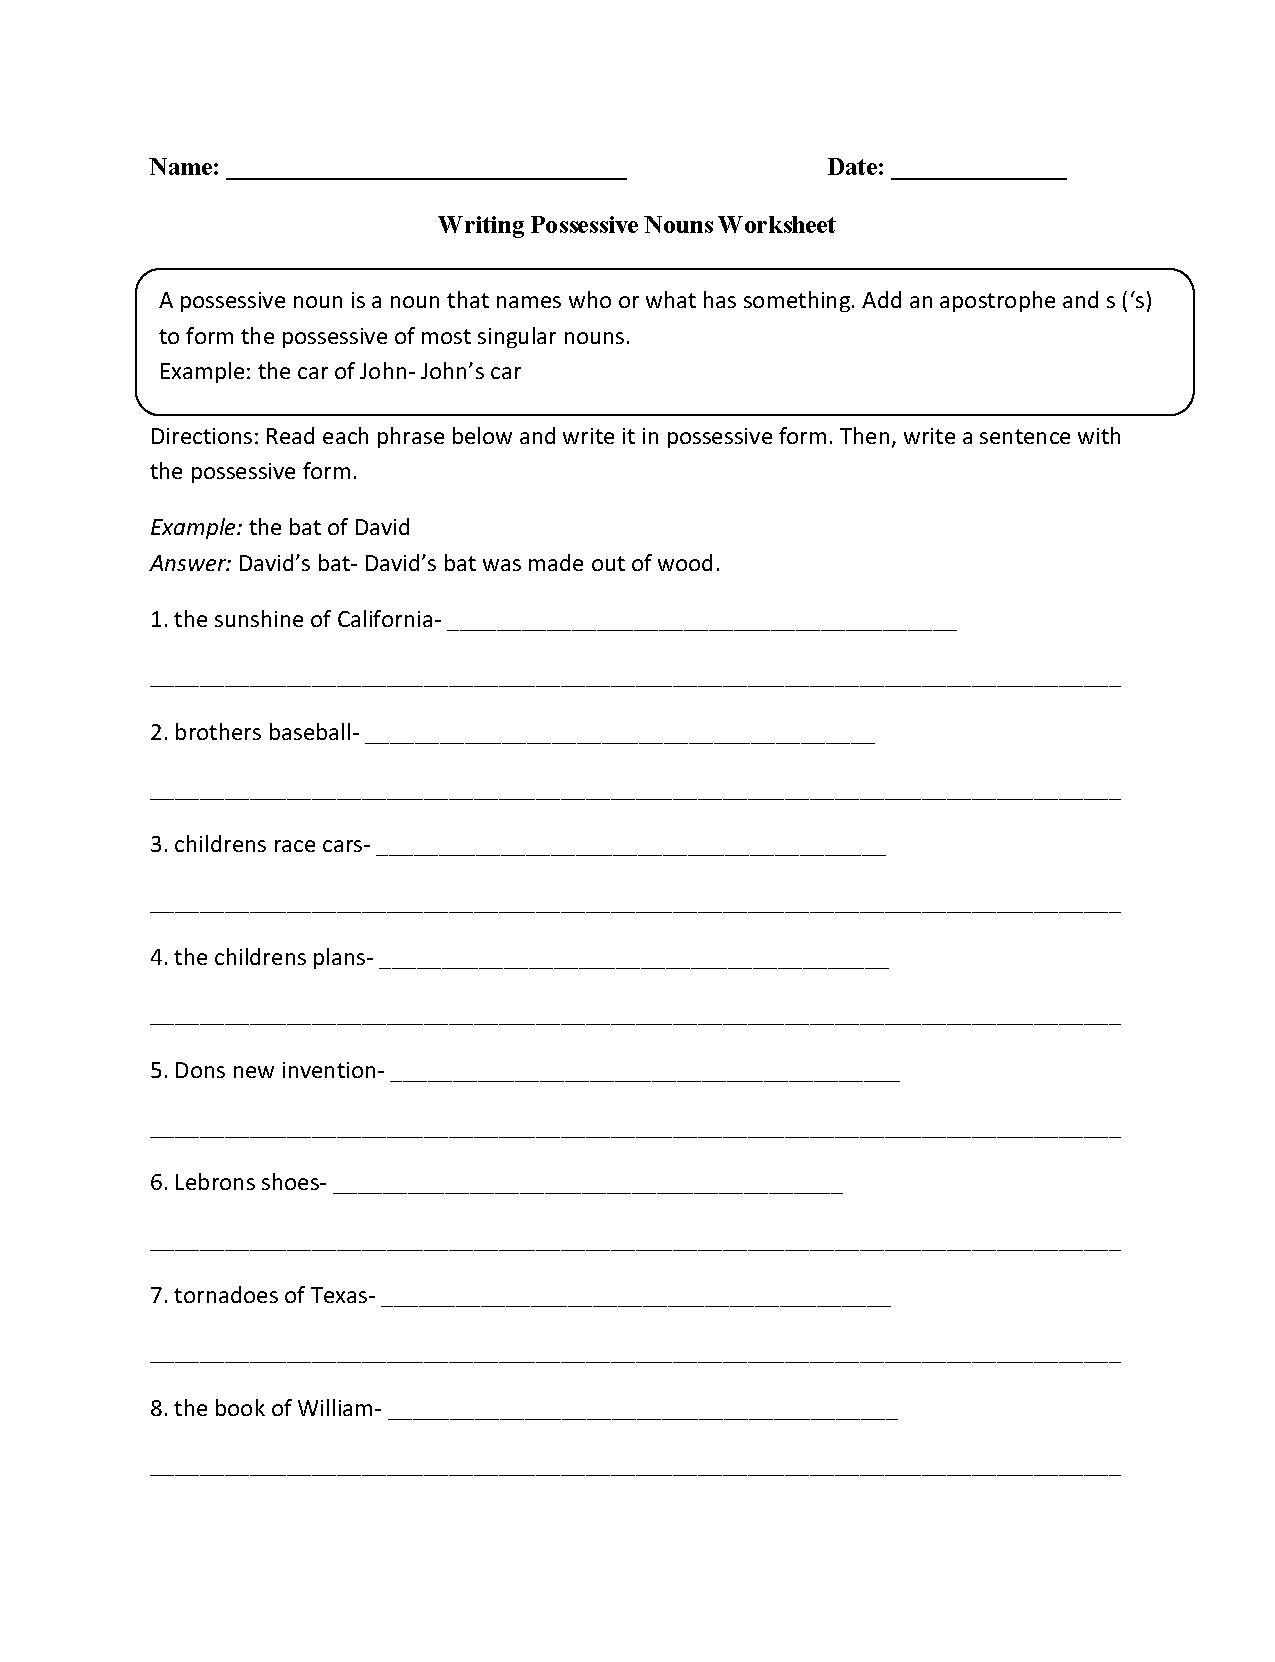 Nouns Worksheets | Possessive Nouns Worksheets - Free Printable Possessive Nouns Worksheets